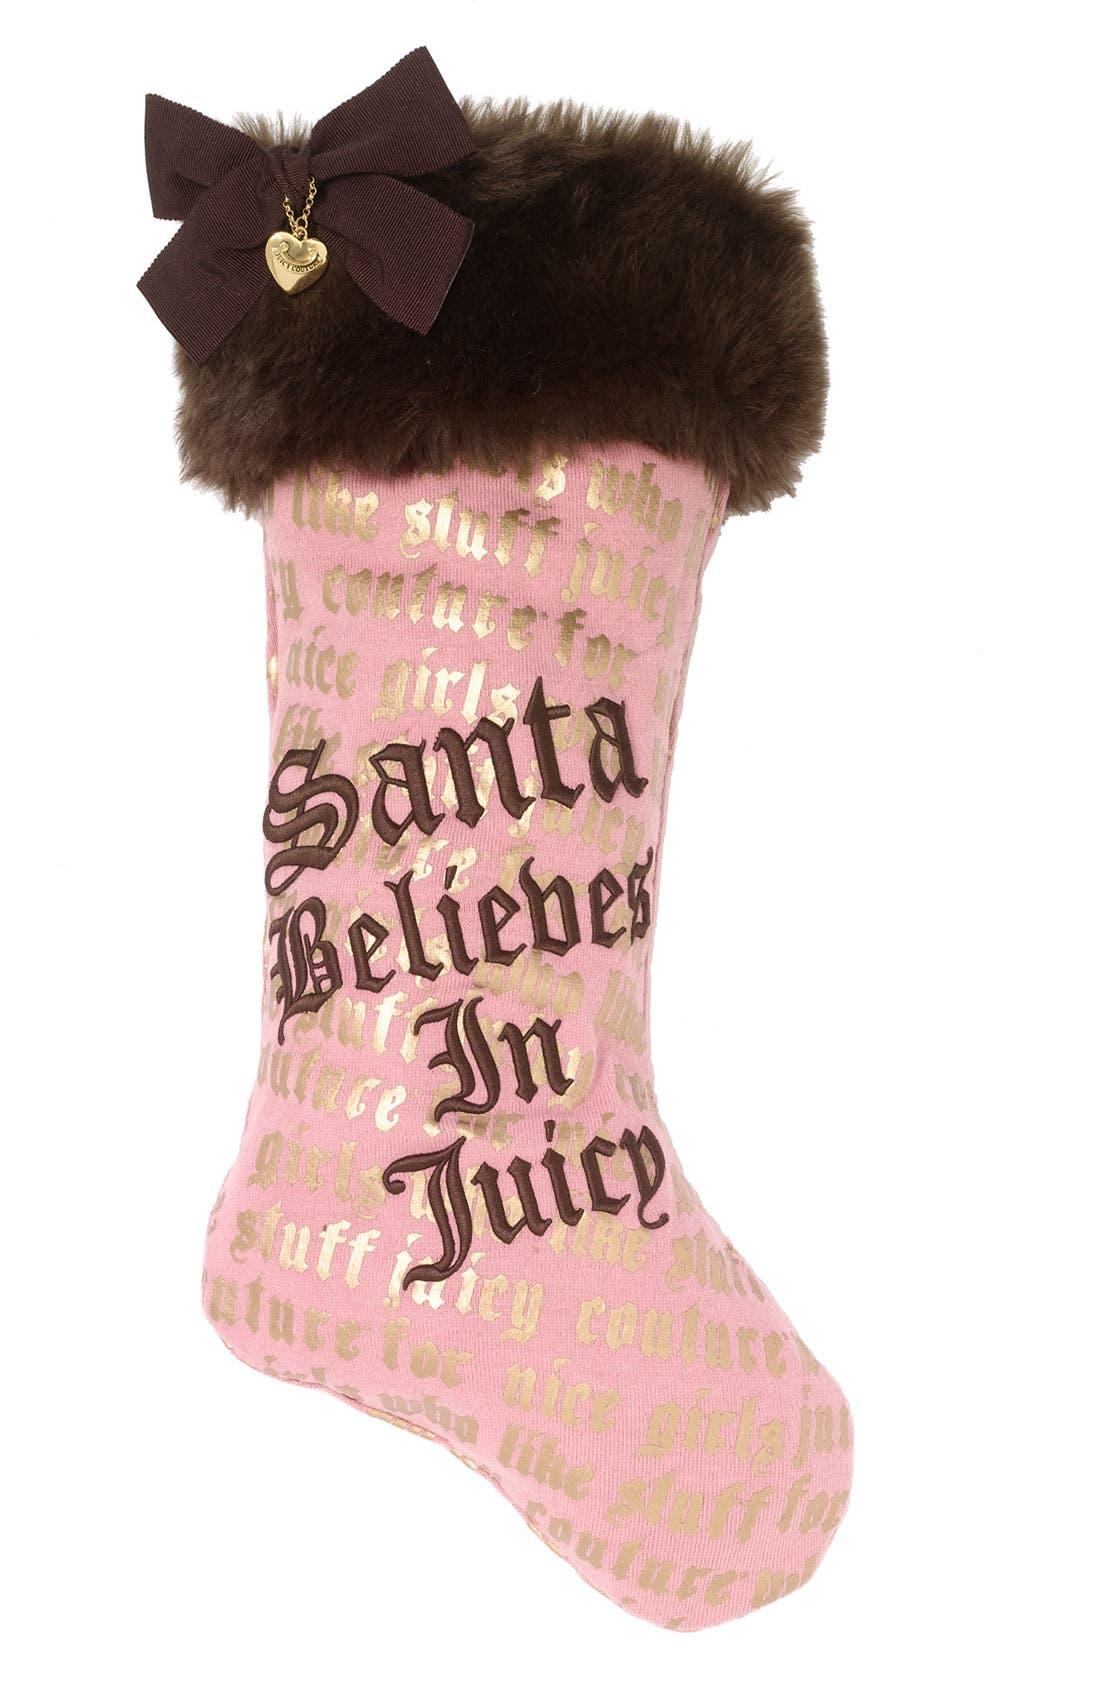 Alternate Image 1 Selected - Juicy Couture 'Santa Believes in Juicy' Holiday Stocking